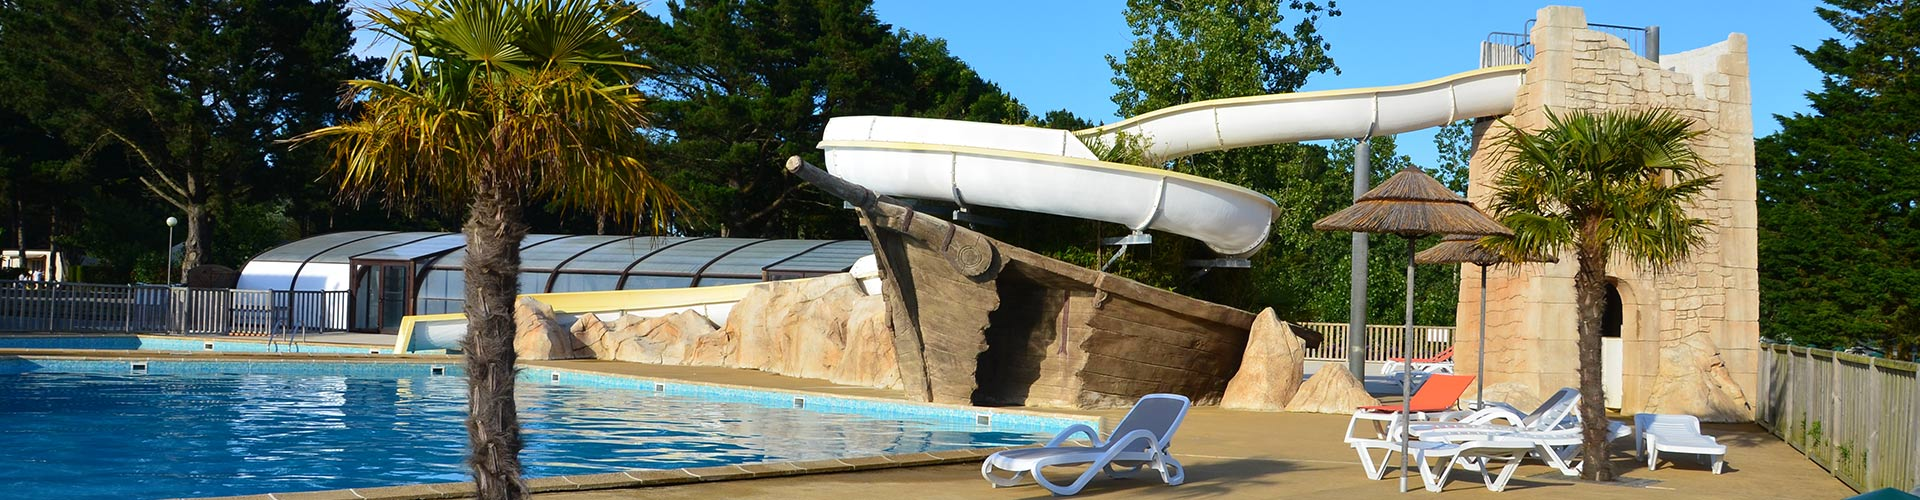 Camping le domaine d 39 inly p nestin camping 4 toiles for Camping morbihan bord de mer avec piscine